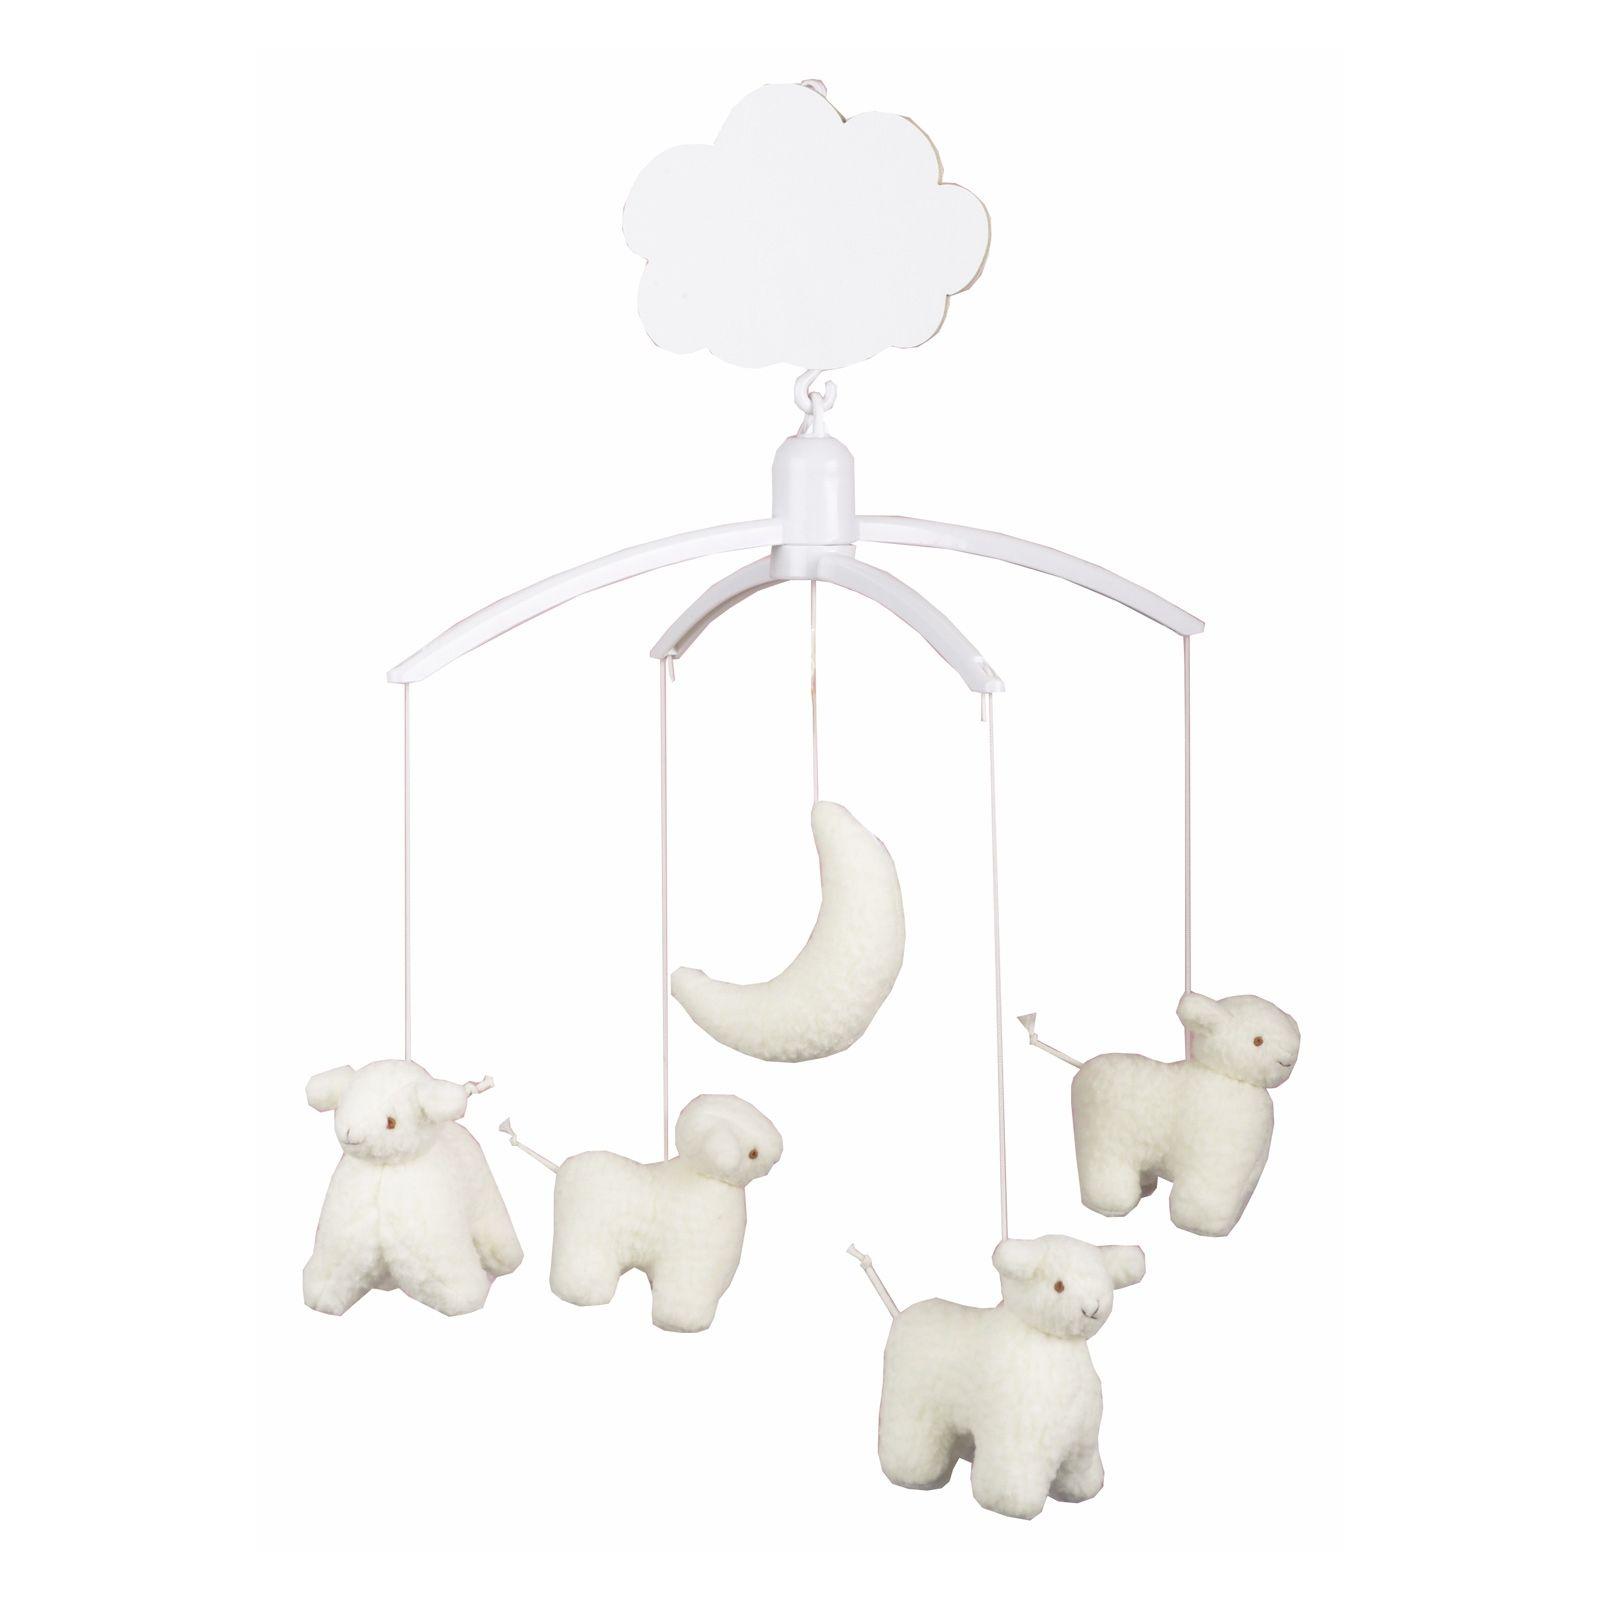 mobile musical moutons et lune trousselier mobile. Black Bedroom Furniture Sets. Home Design Ideas